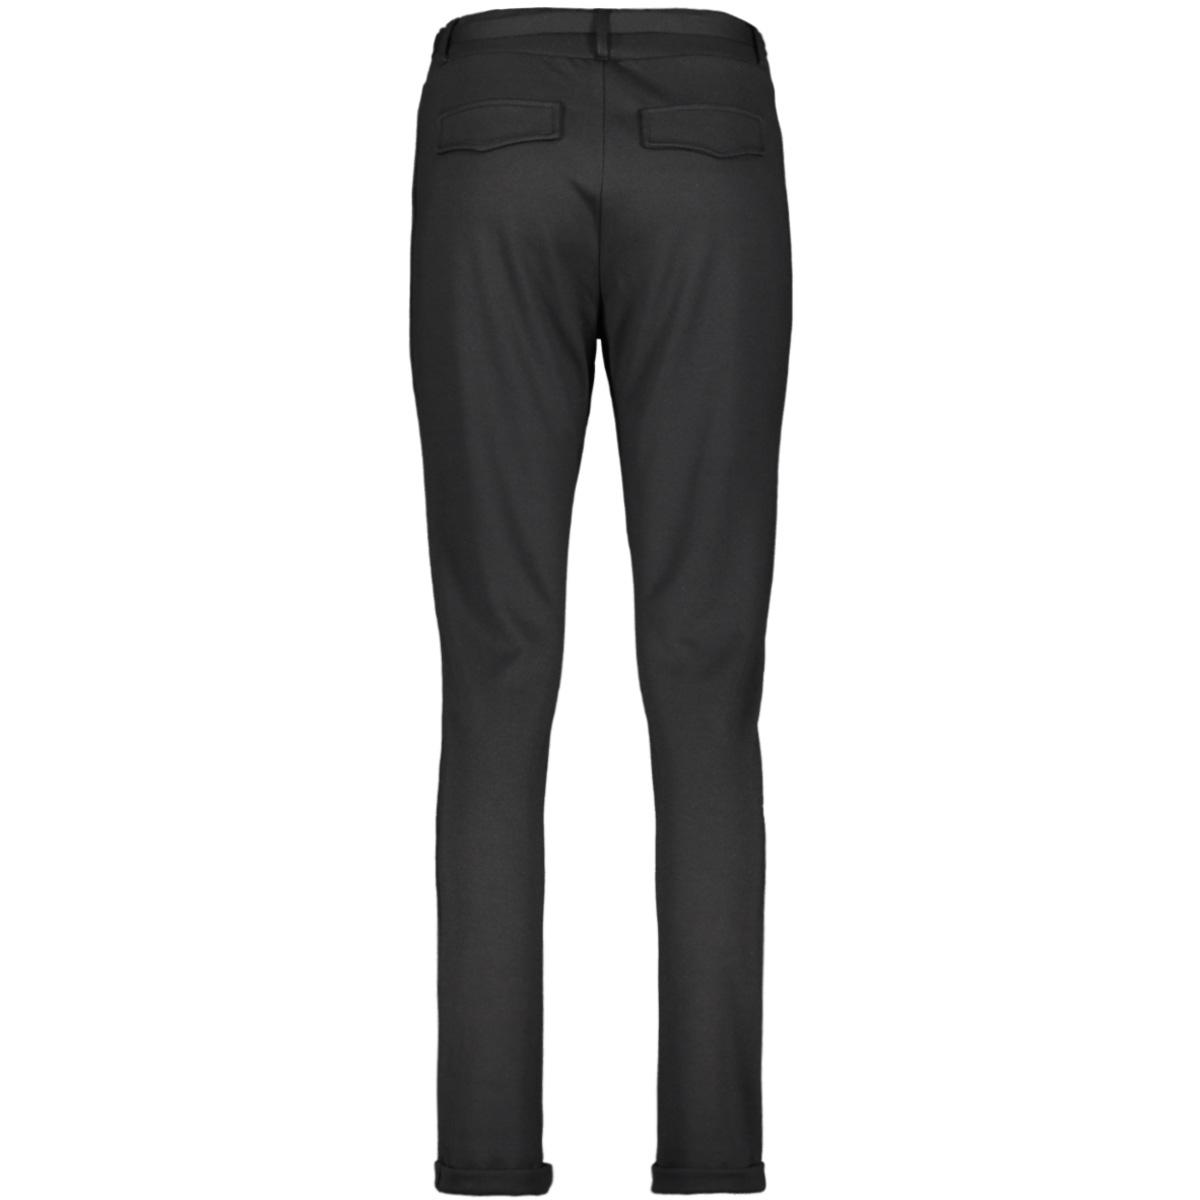 jenna punto trouser 195 zoso broek black